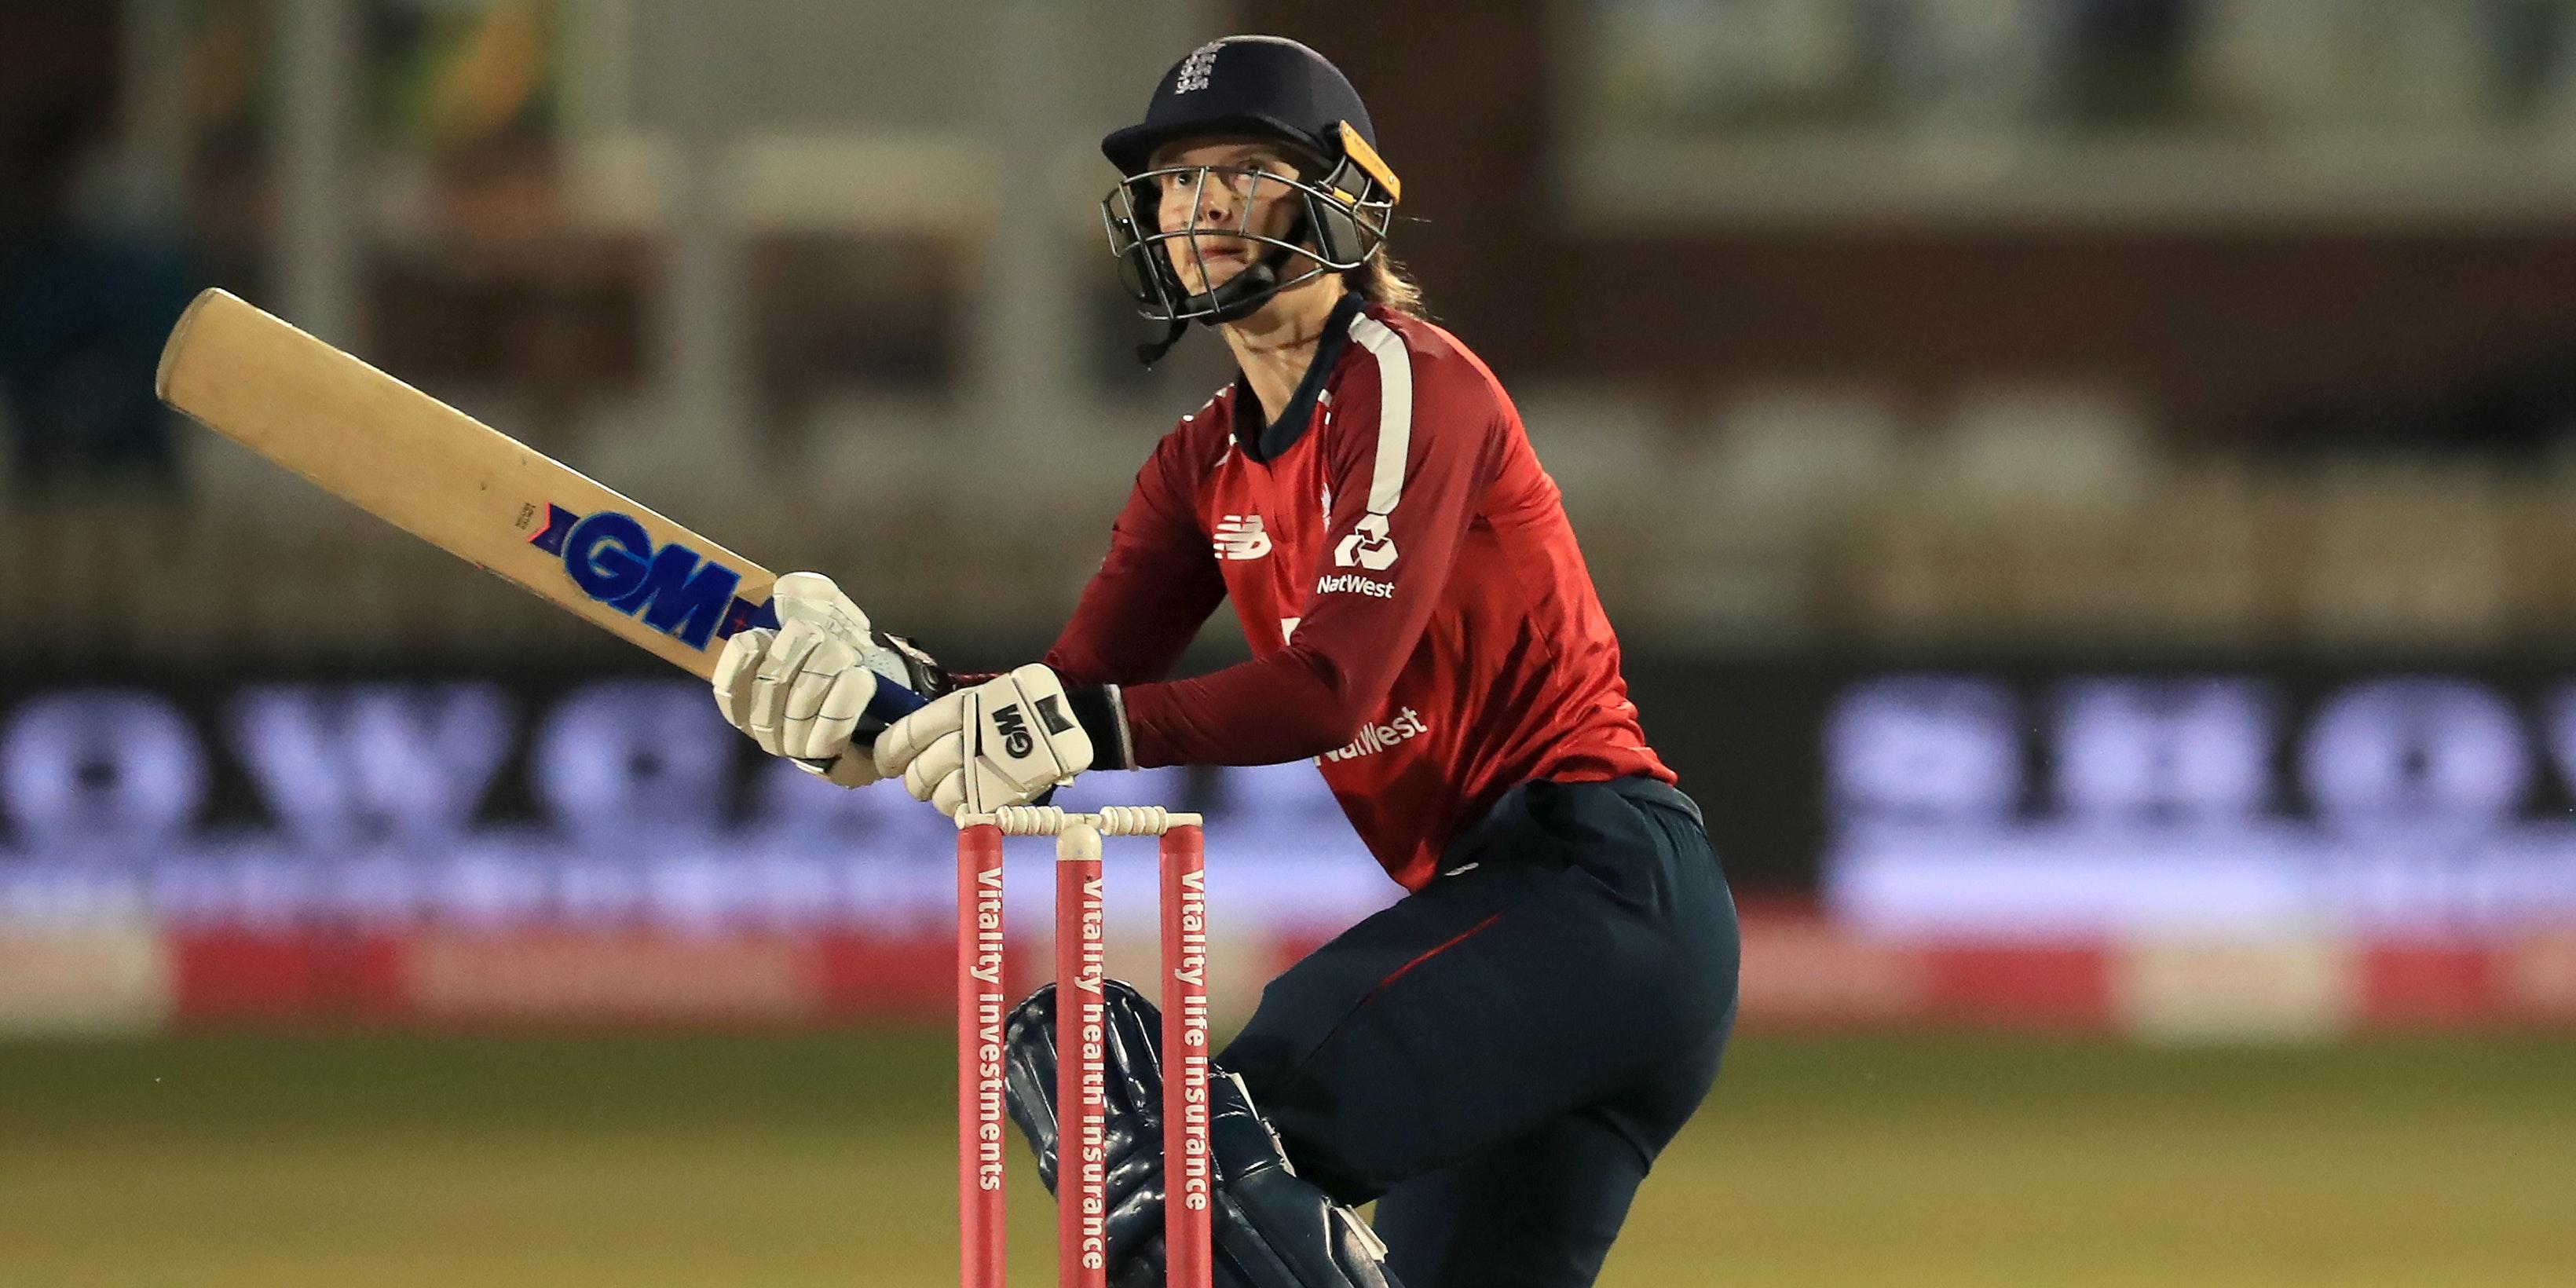 Amy Jones relishing new role as England Women win again